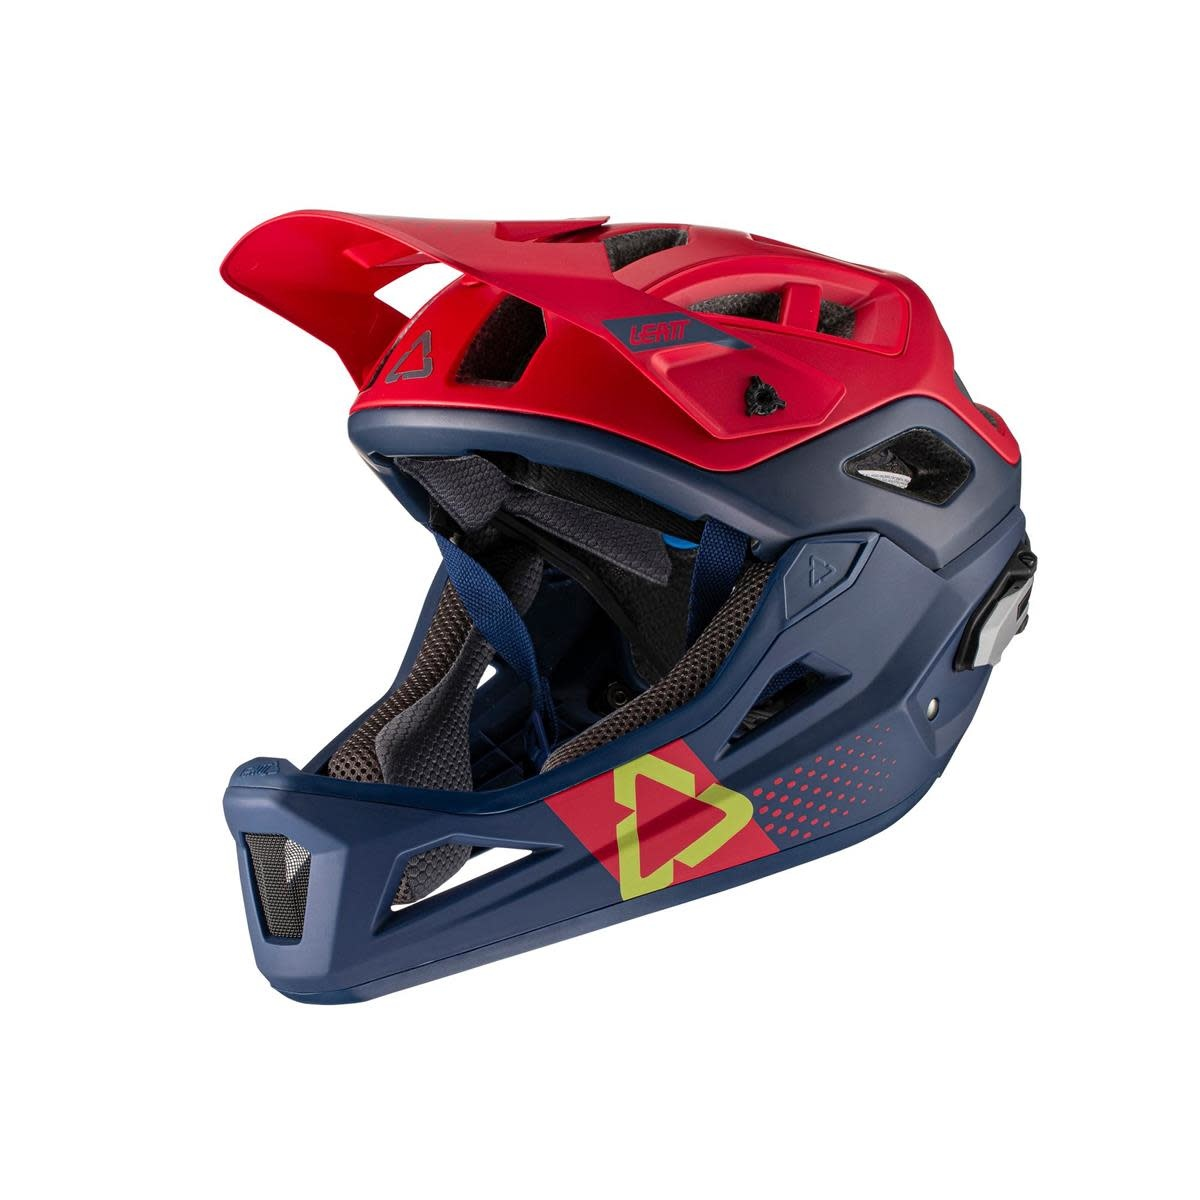 Leatt Leatt MTB 3.0 Enduro Helmet, S (51-55cm) Chilli